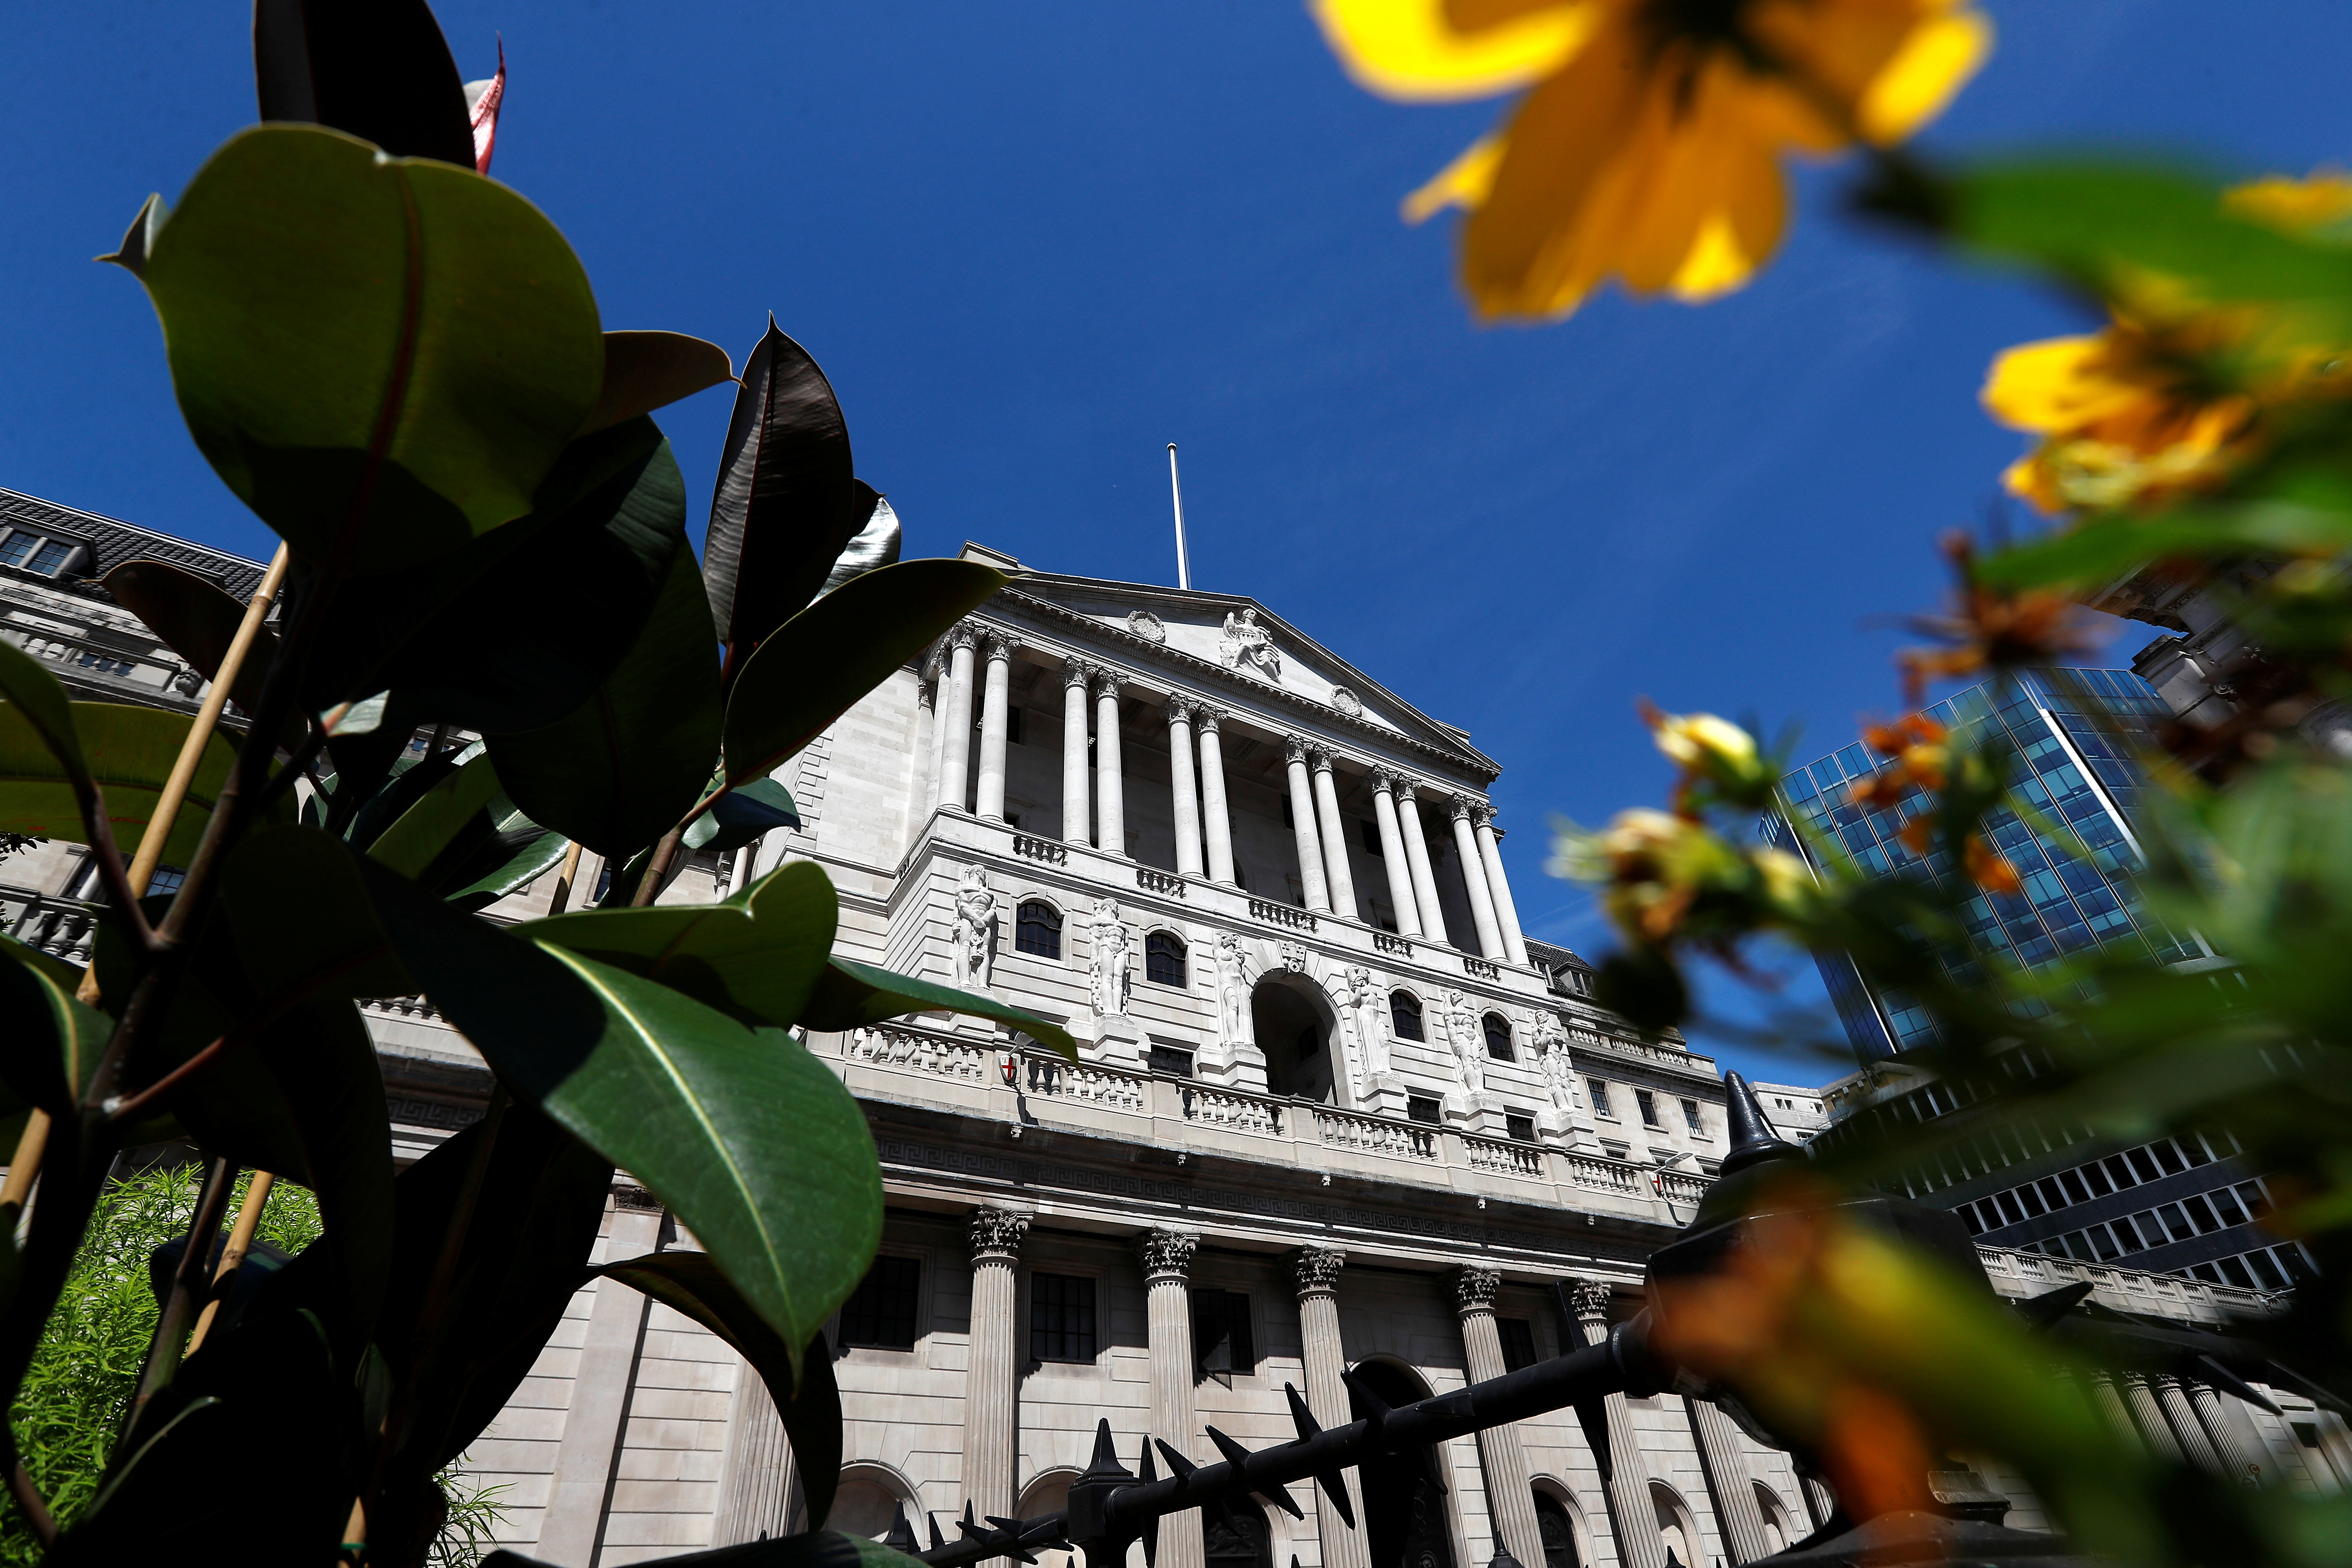 Flowers in bloom are sen opposite the Bank of England, in London, Britain August 1, 2018. REUTERS/Peter Nicholls